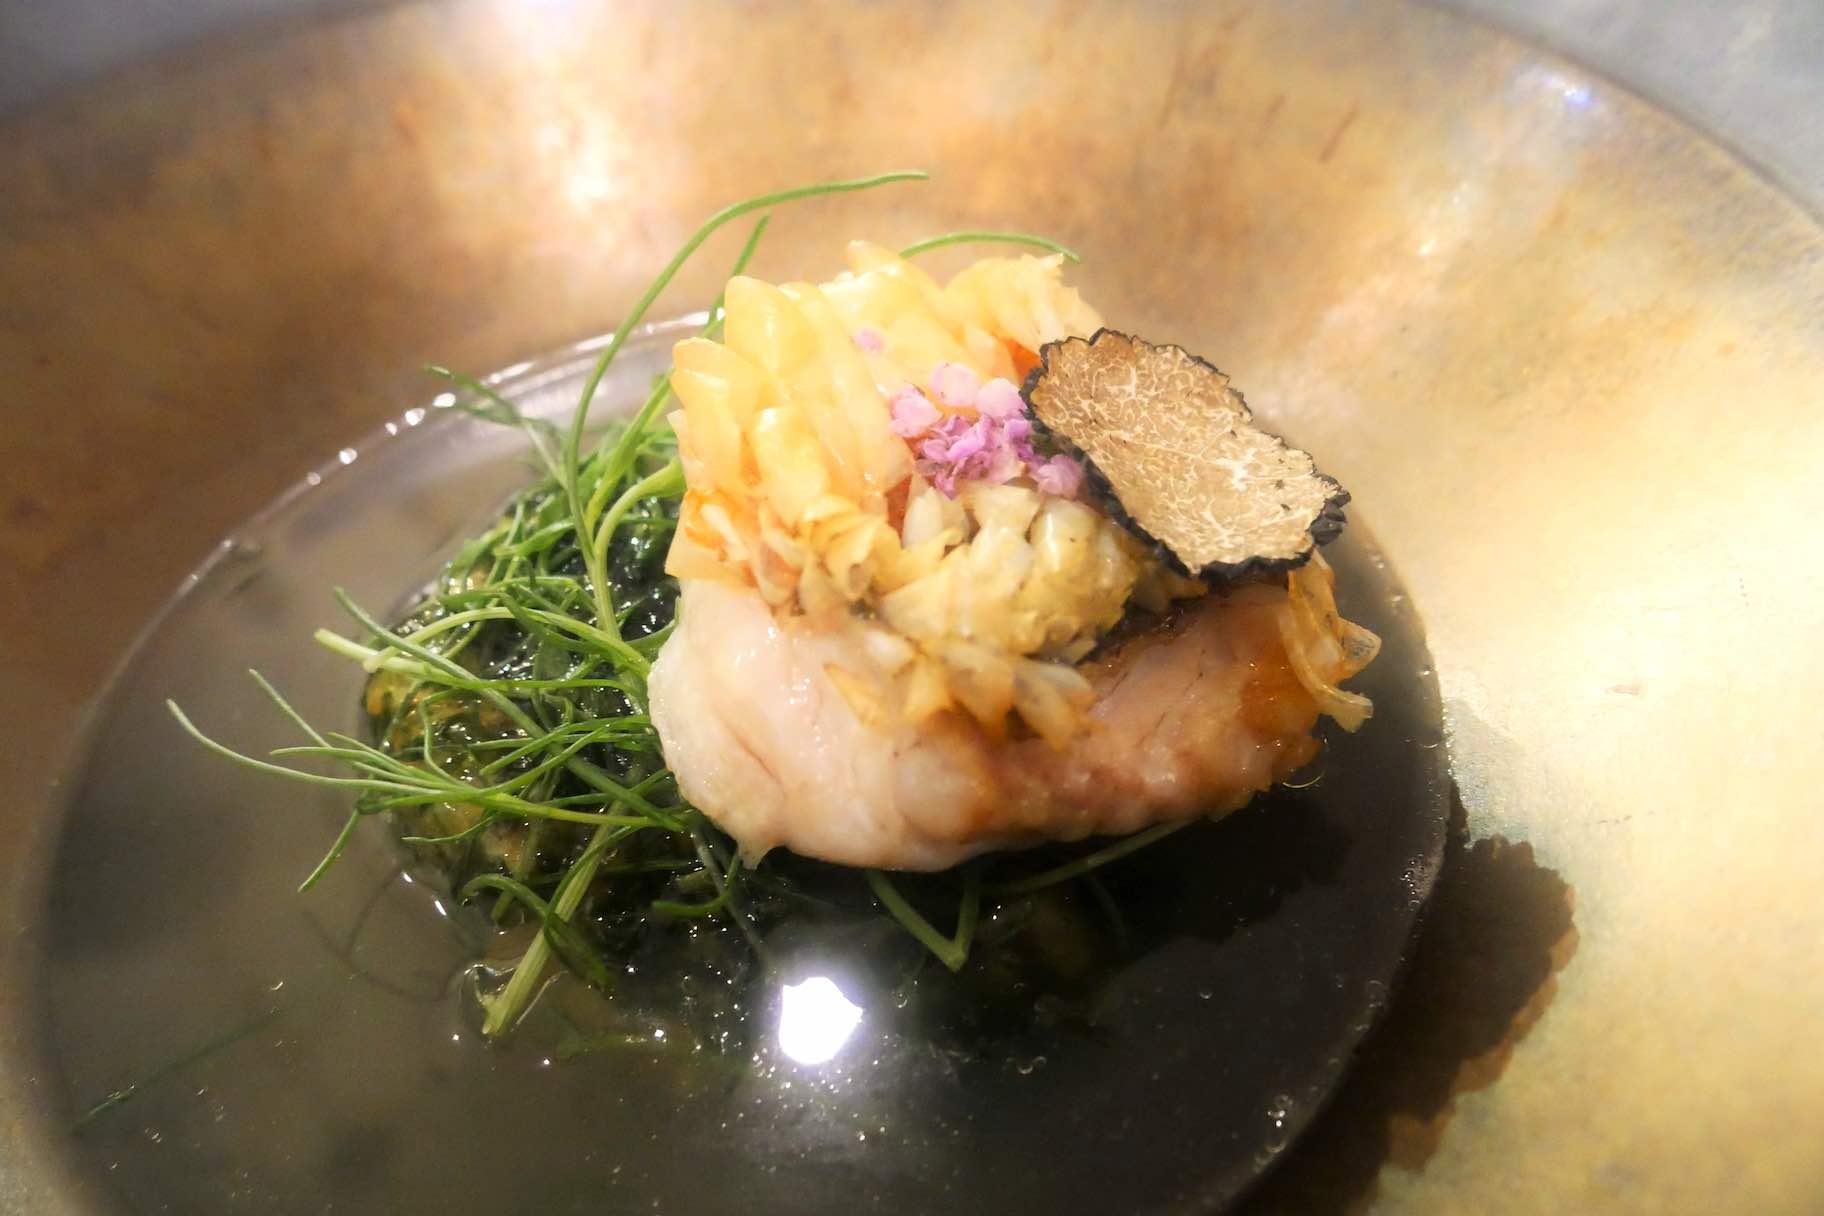 lewin-terrace-amadai-black-truffle-koshihikari-seaweed-aspirantsg